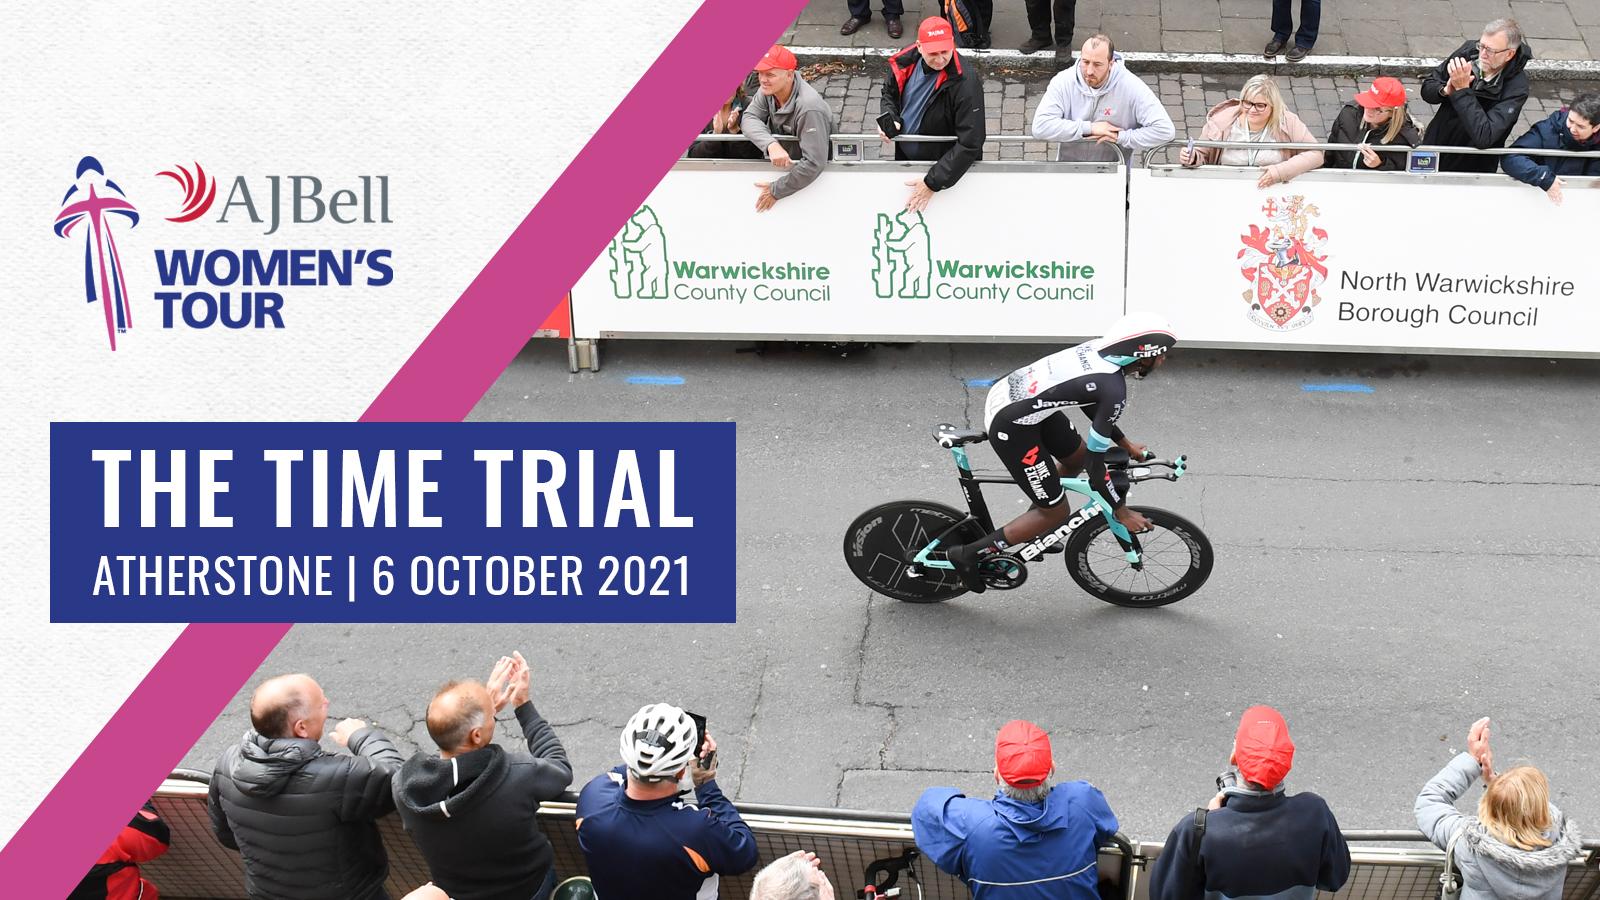 Women's Tour Time Trial